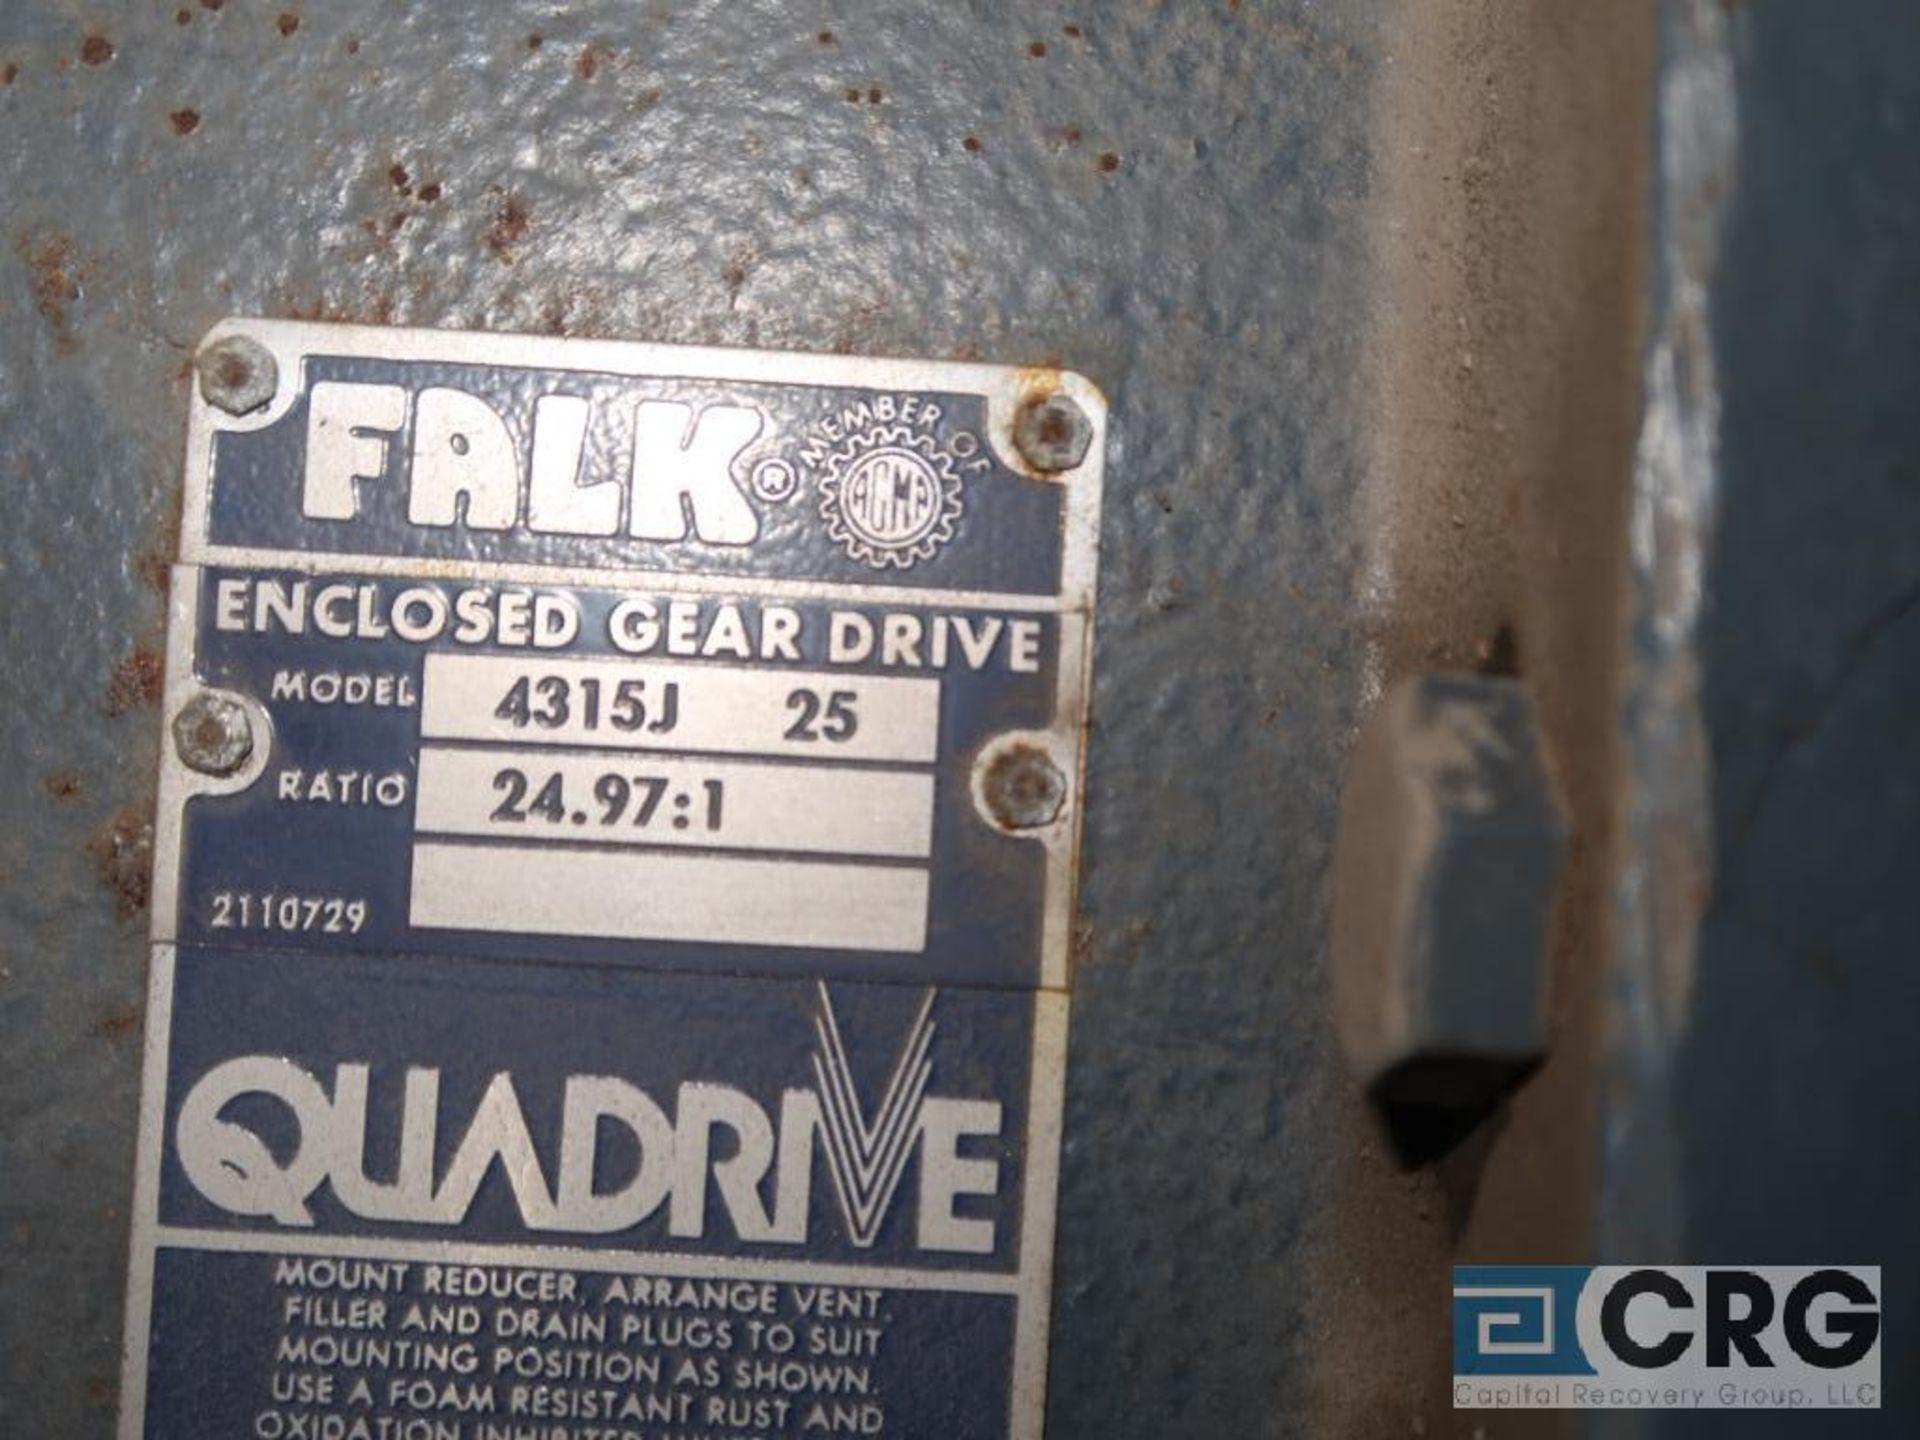 Falk 4315J25 quadrive, ratio-24.97 (Next Bay Cage Area) - Image 2 of 2